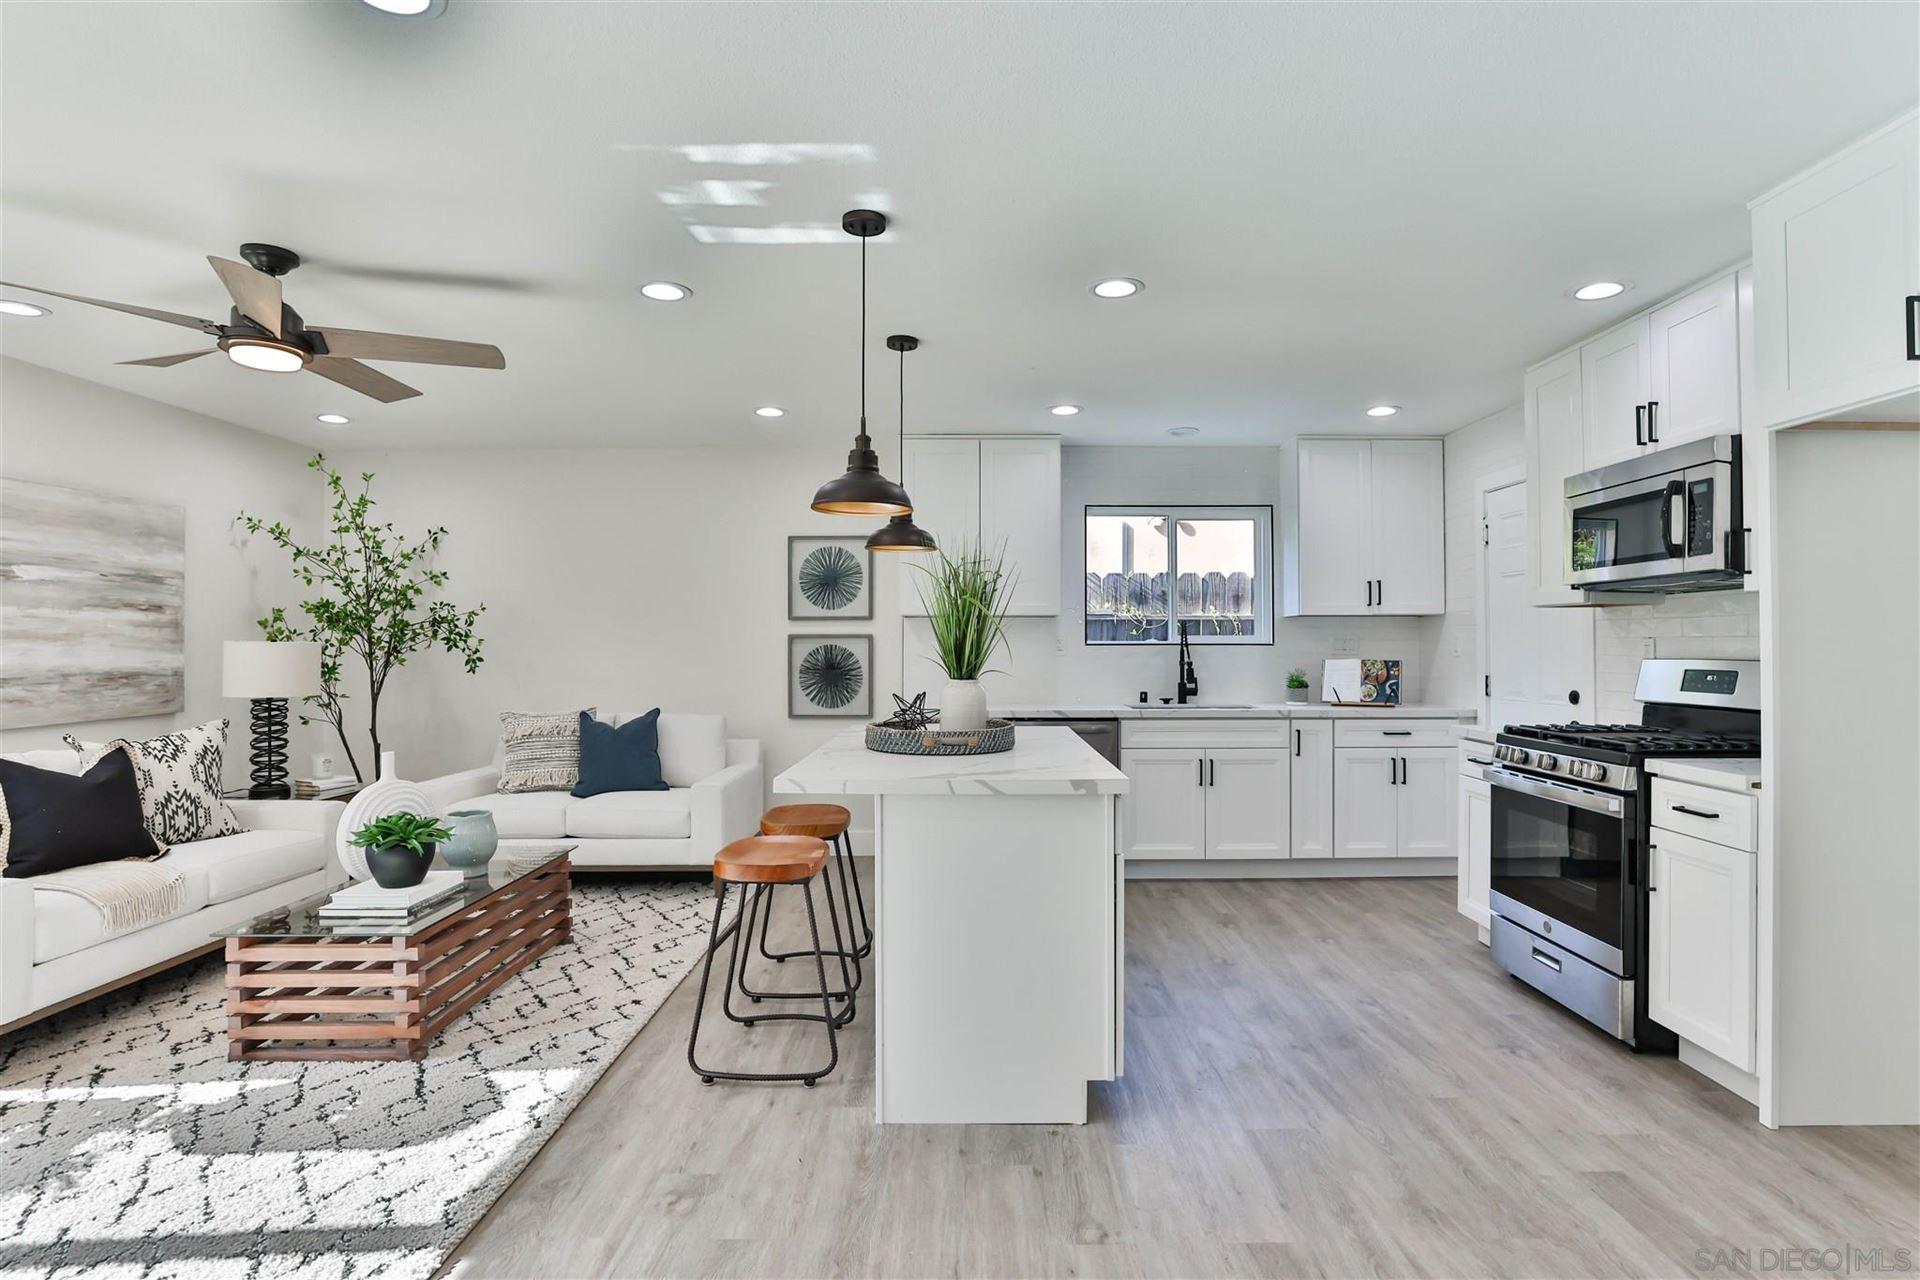 Photo of 7342 Fulwood Ln, San Diego, CA 92111 (MLS # 210021746)